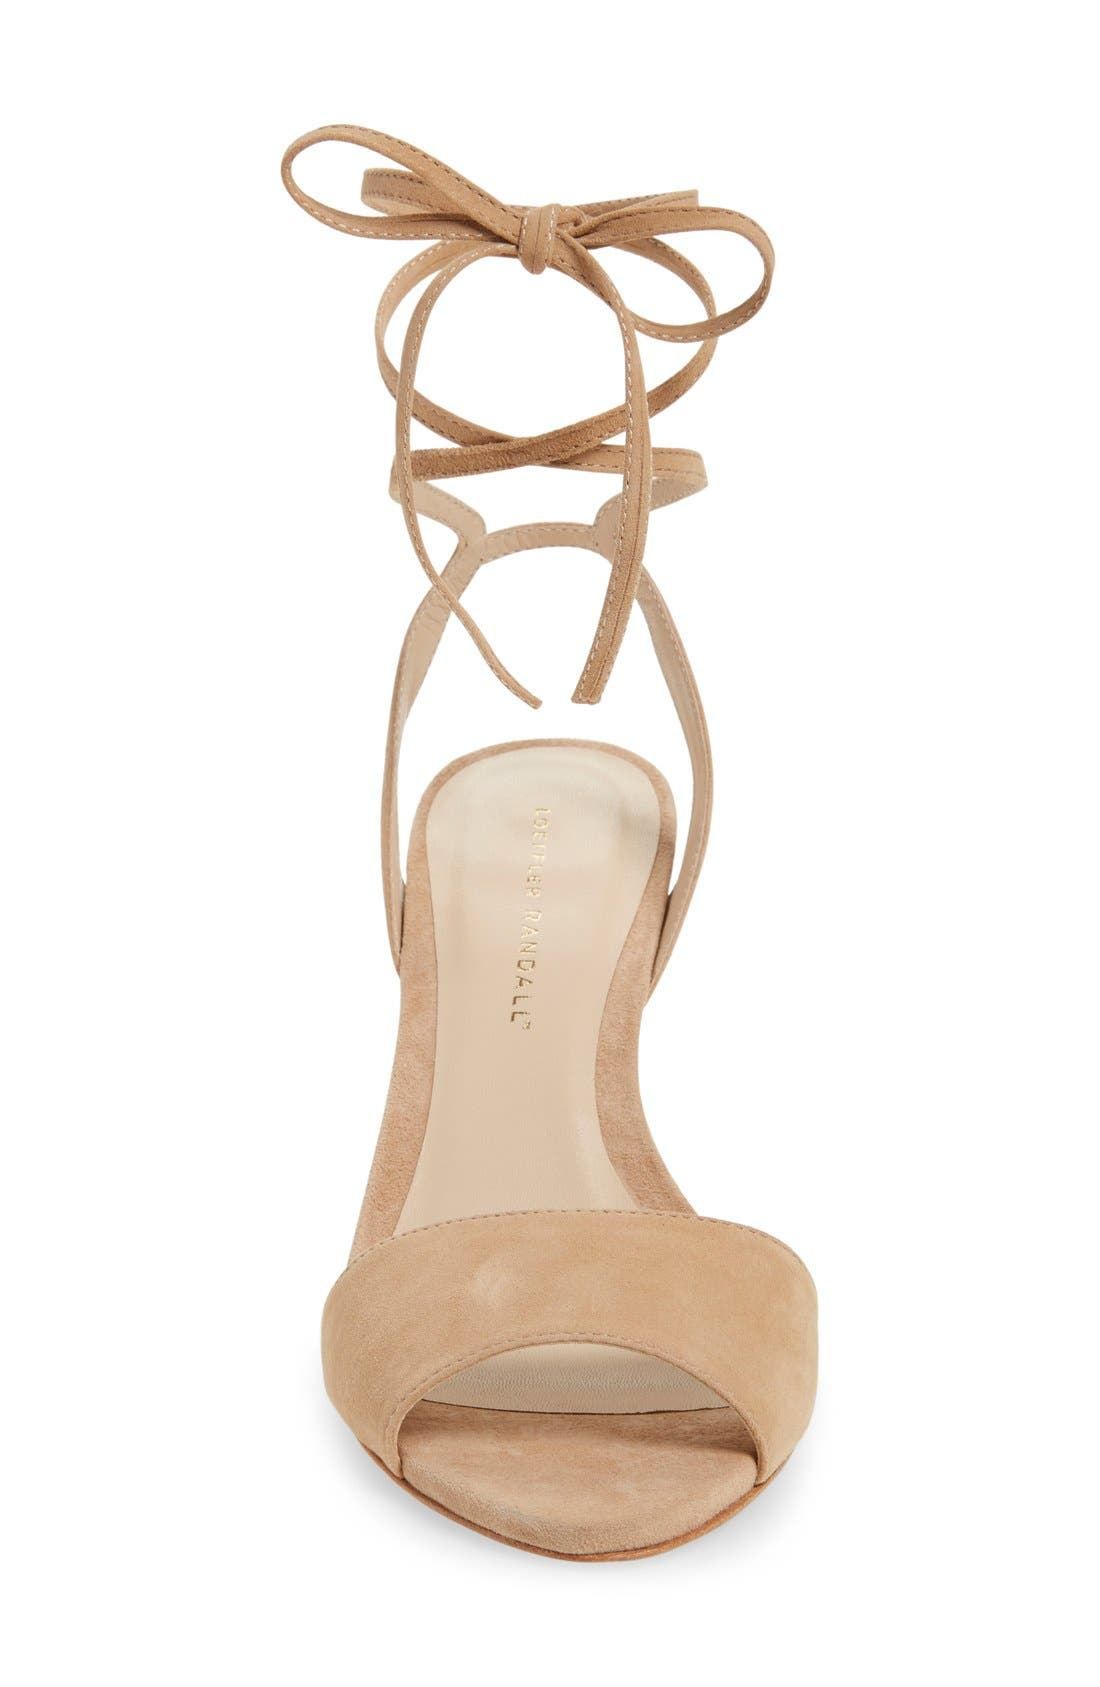 Alternate Image 3  - Loeffler Randall 'Elyse' Lace-Up Sandal (Women)